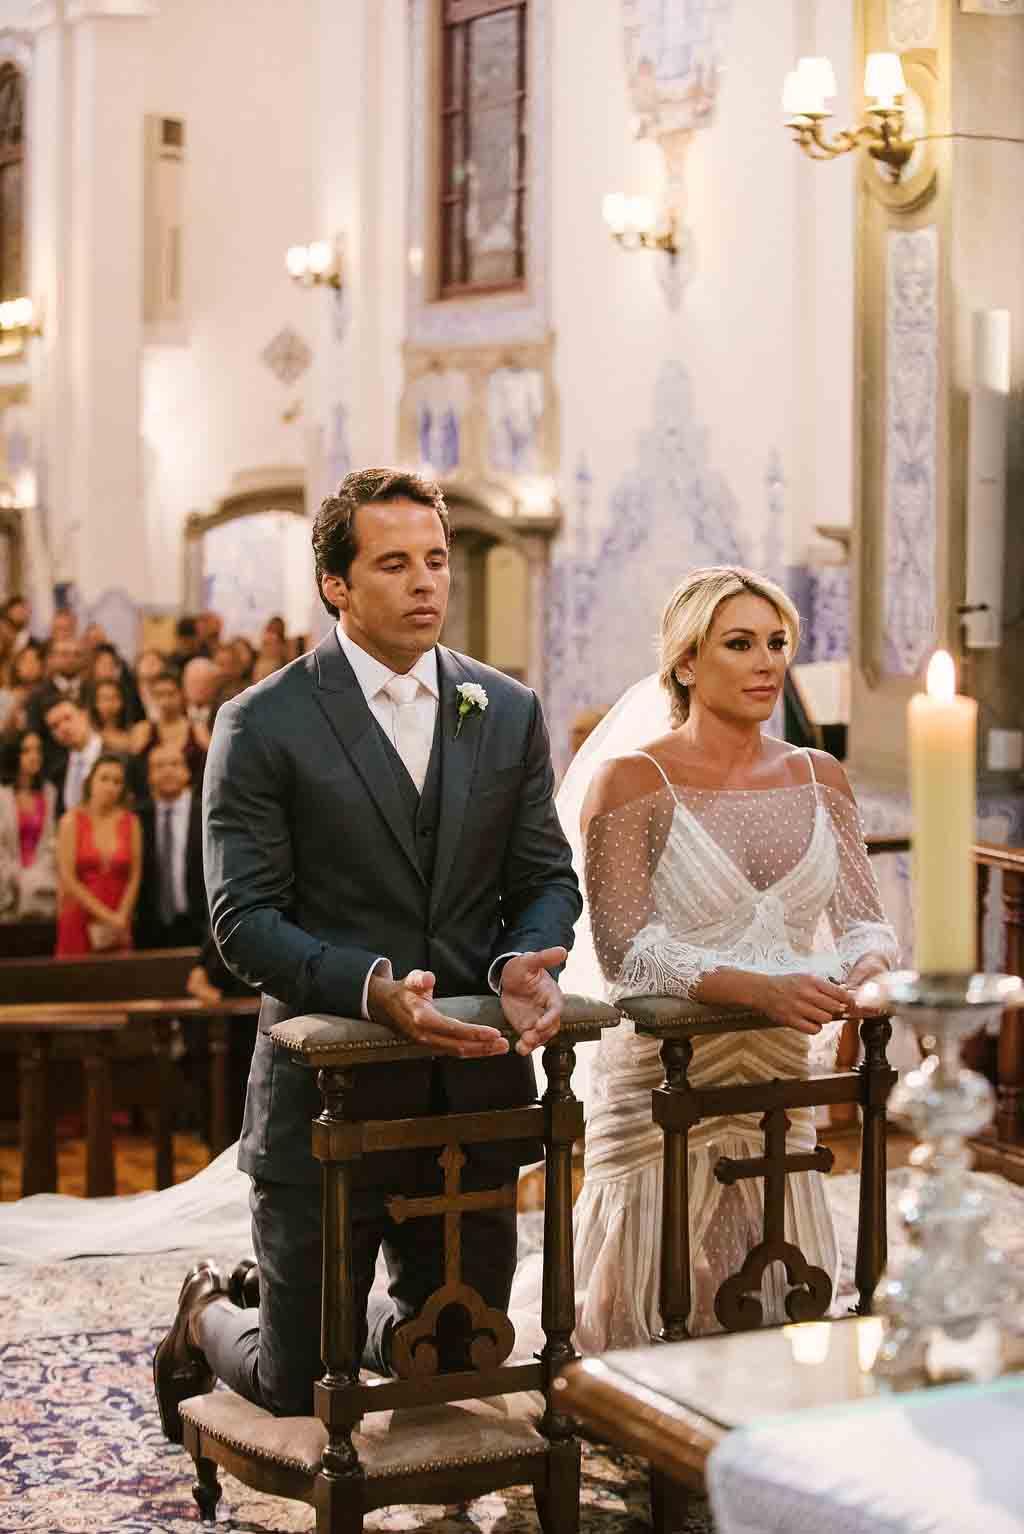 casamento-marcellaeandre-lucaslimafotografia-459